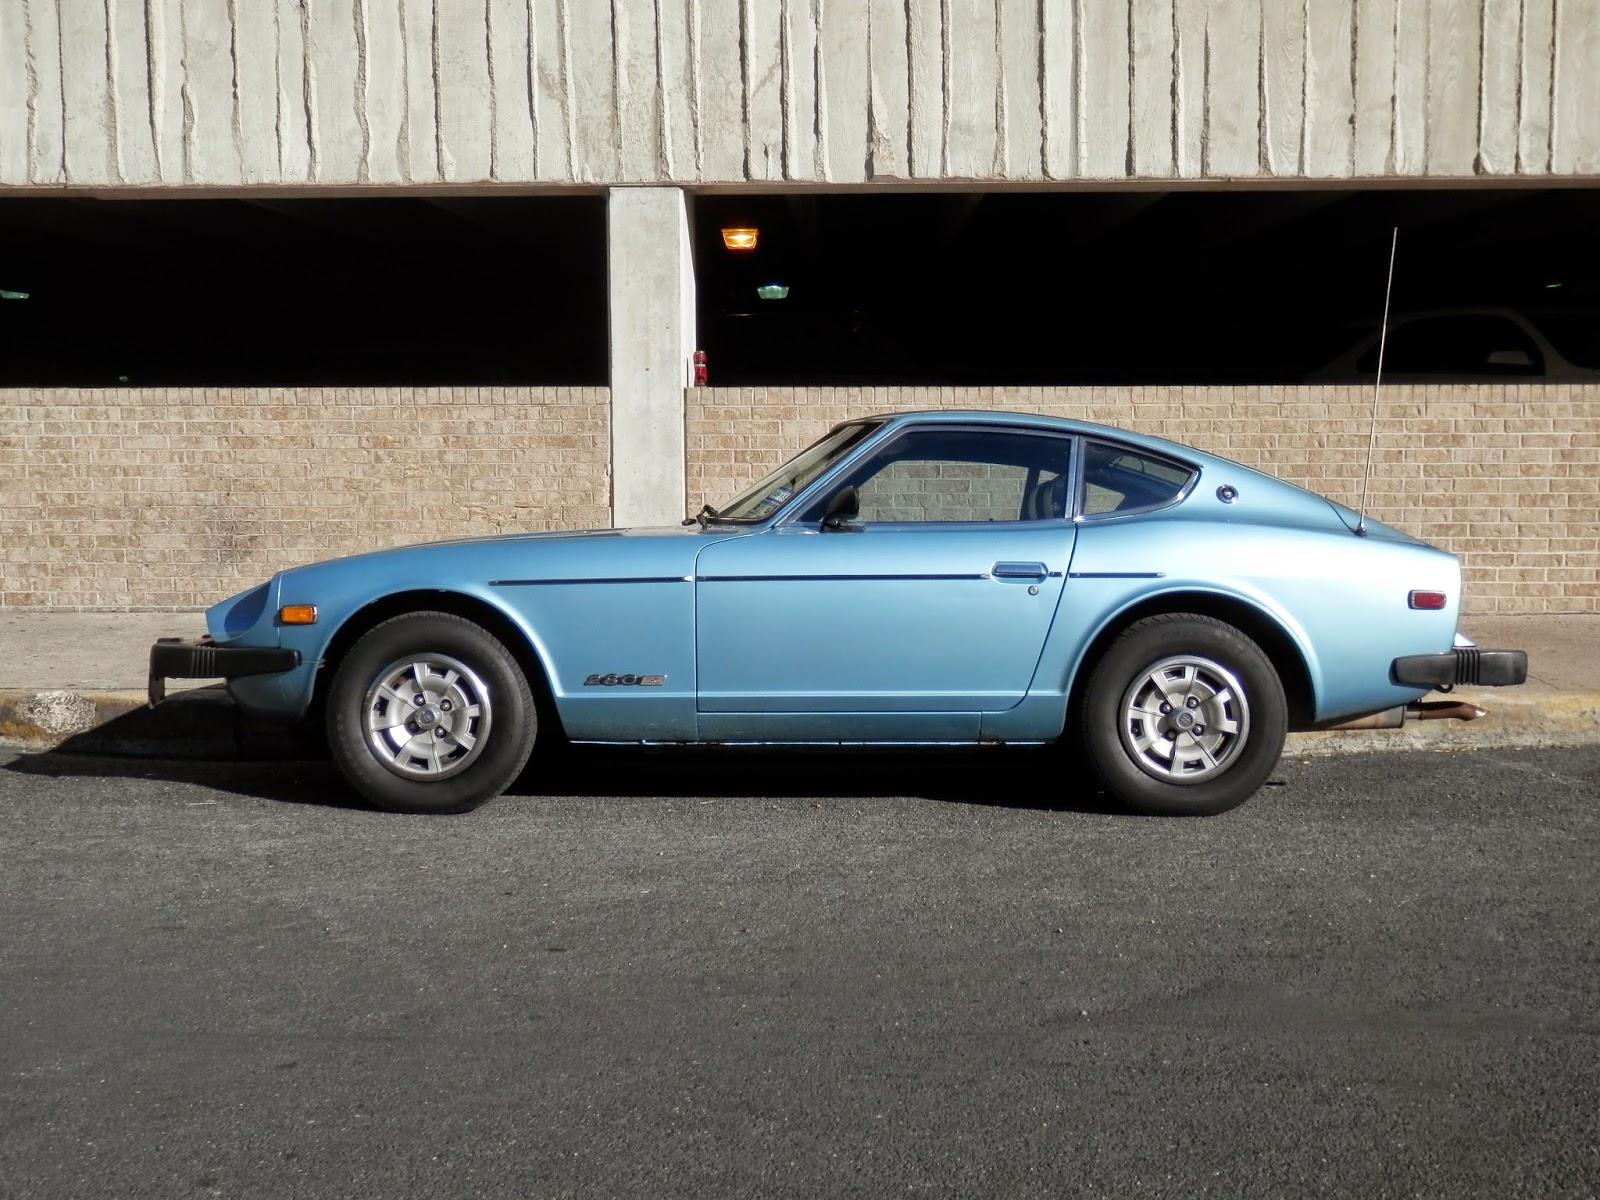 Shifting Gears: Random Car Wednesday: 1977 Datsun 280Z